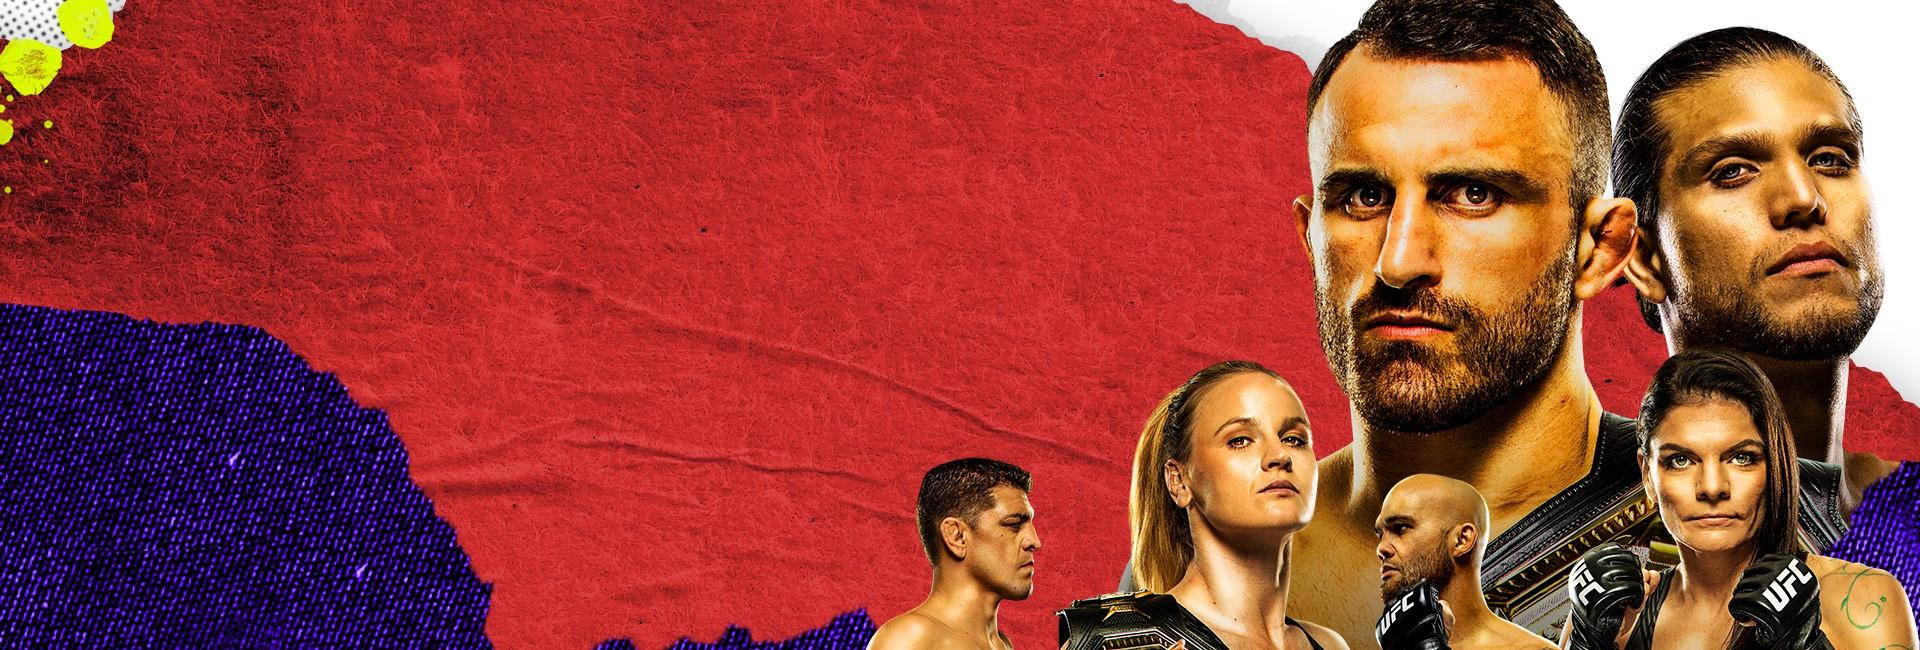 UFC 266: Volkanovski vs. Ortega (26. 9. 2021 4:00)